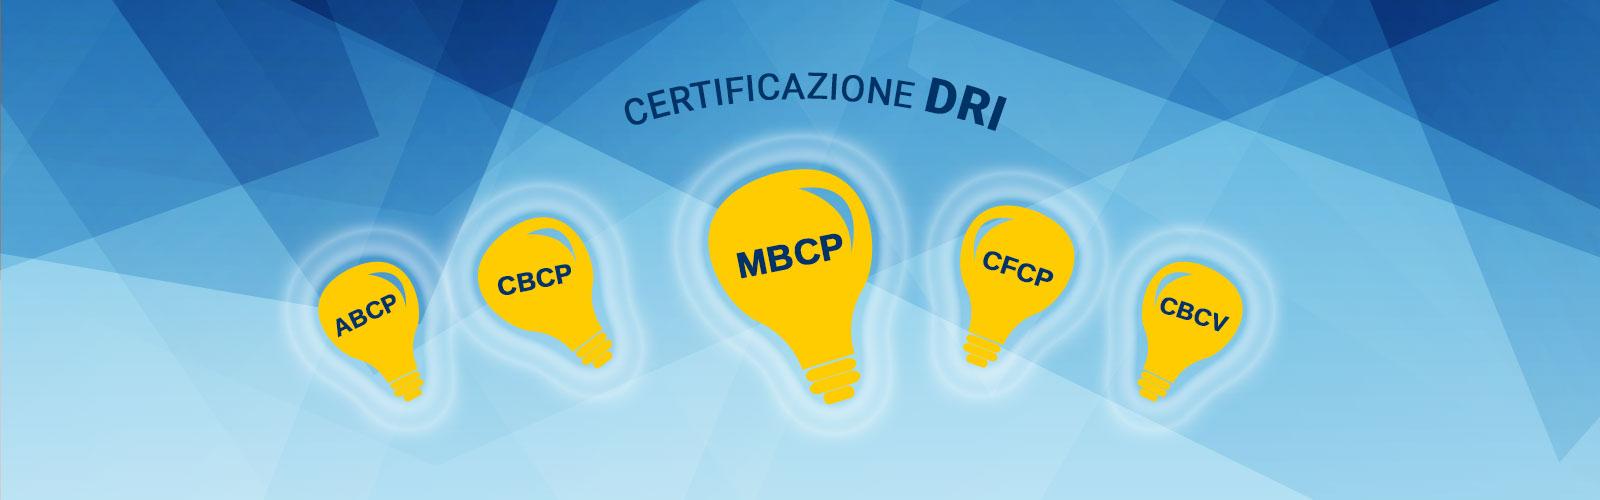 Certificazioni DRI